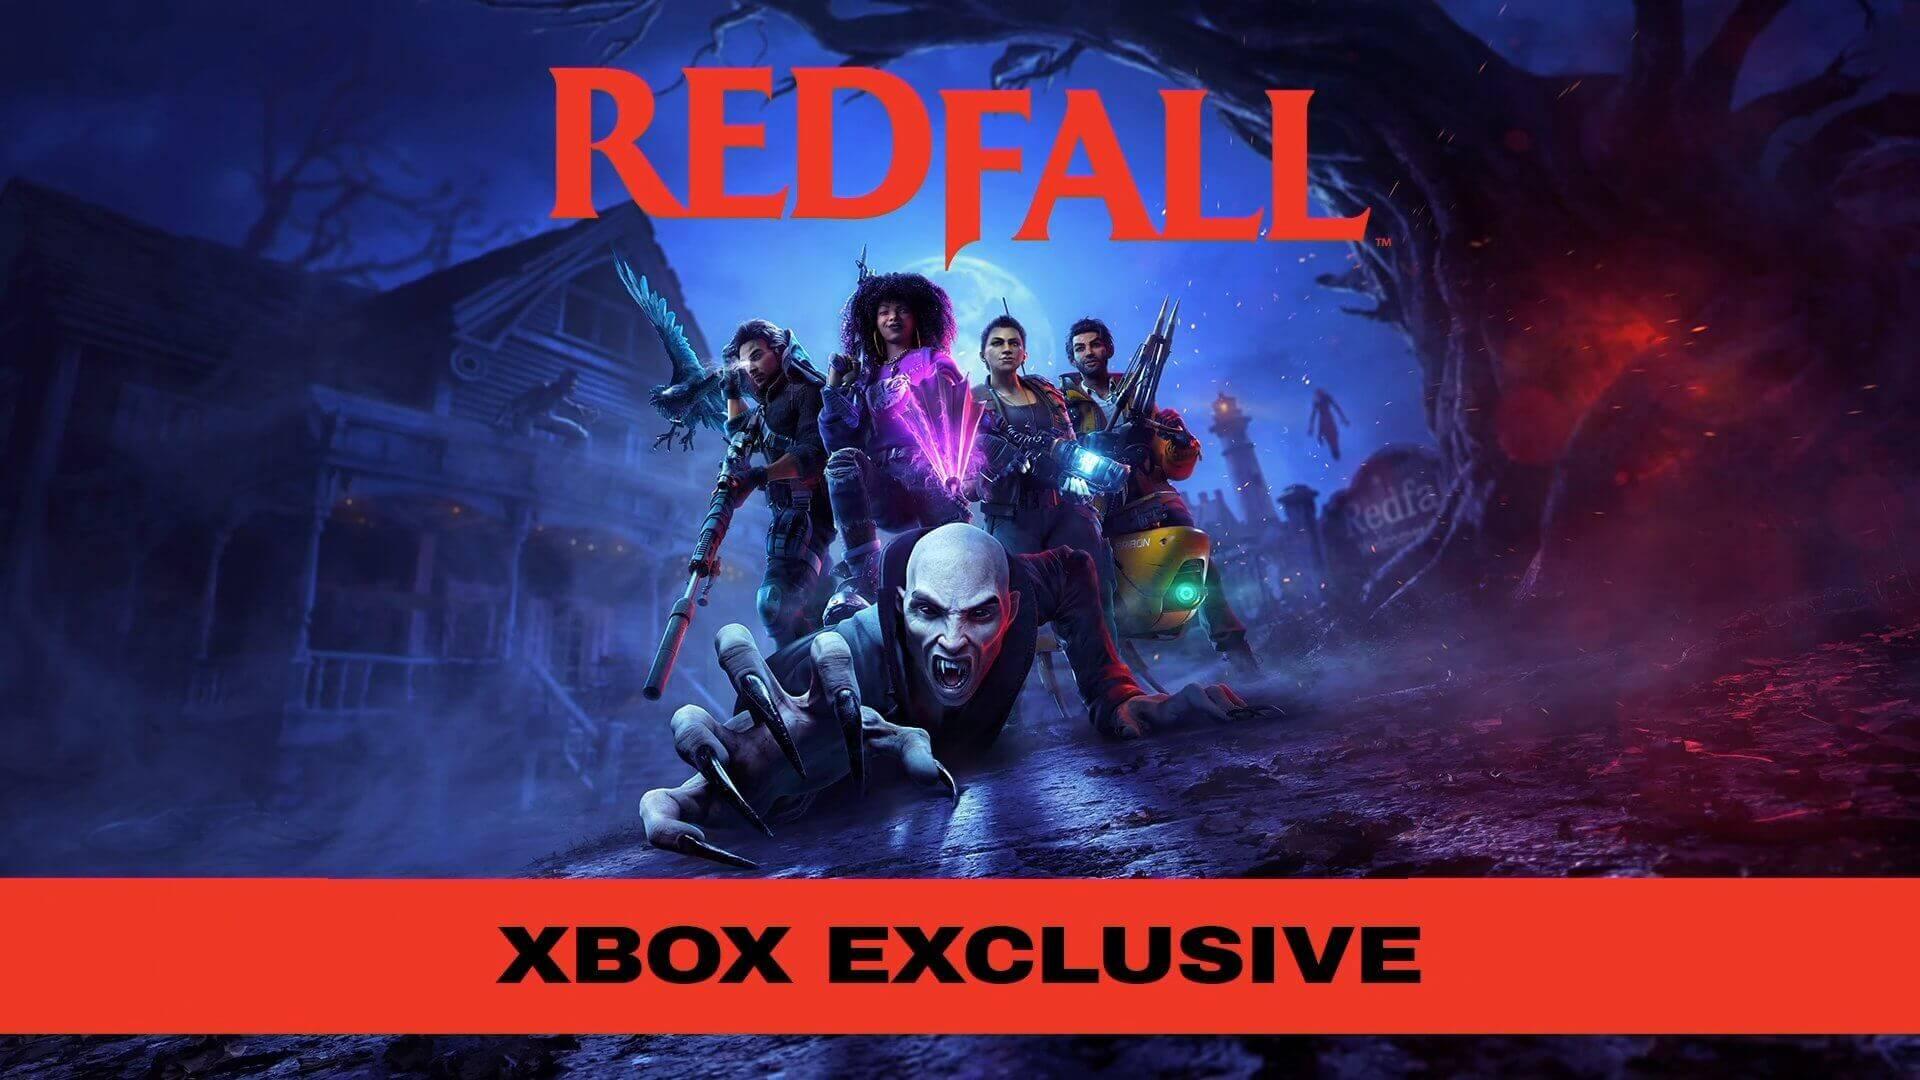 Game Pass, Xbox, Xbox Game Pass, Microsoft, Redfall, Delfos